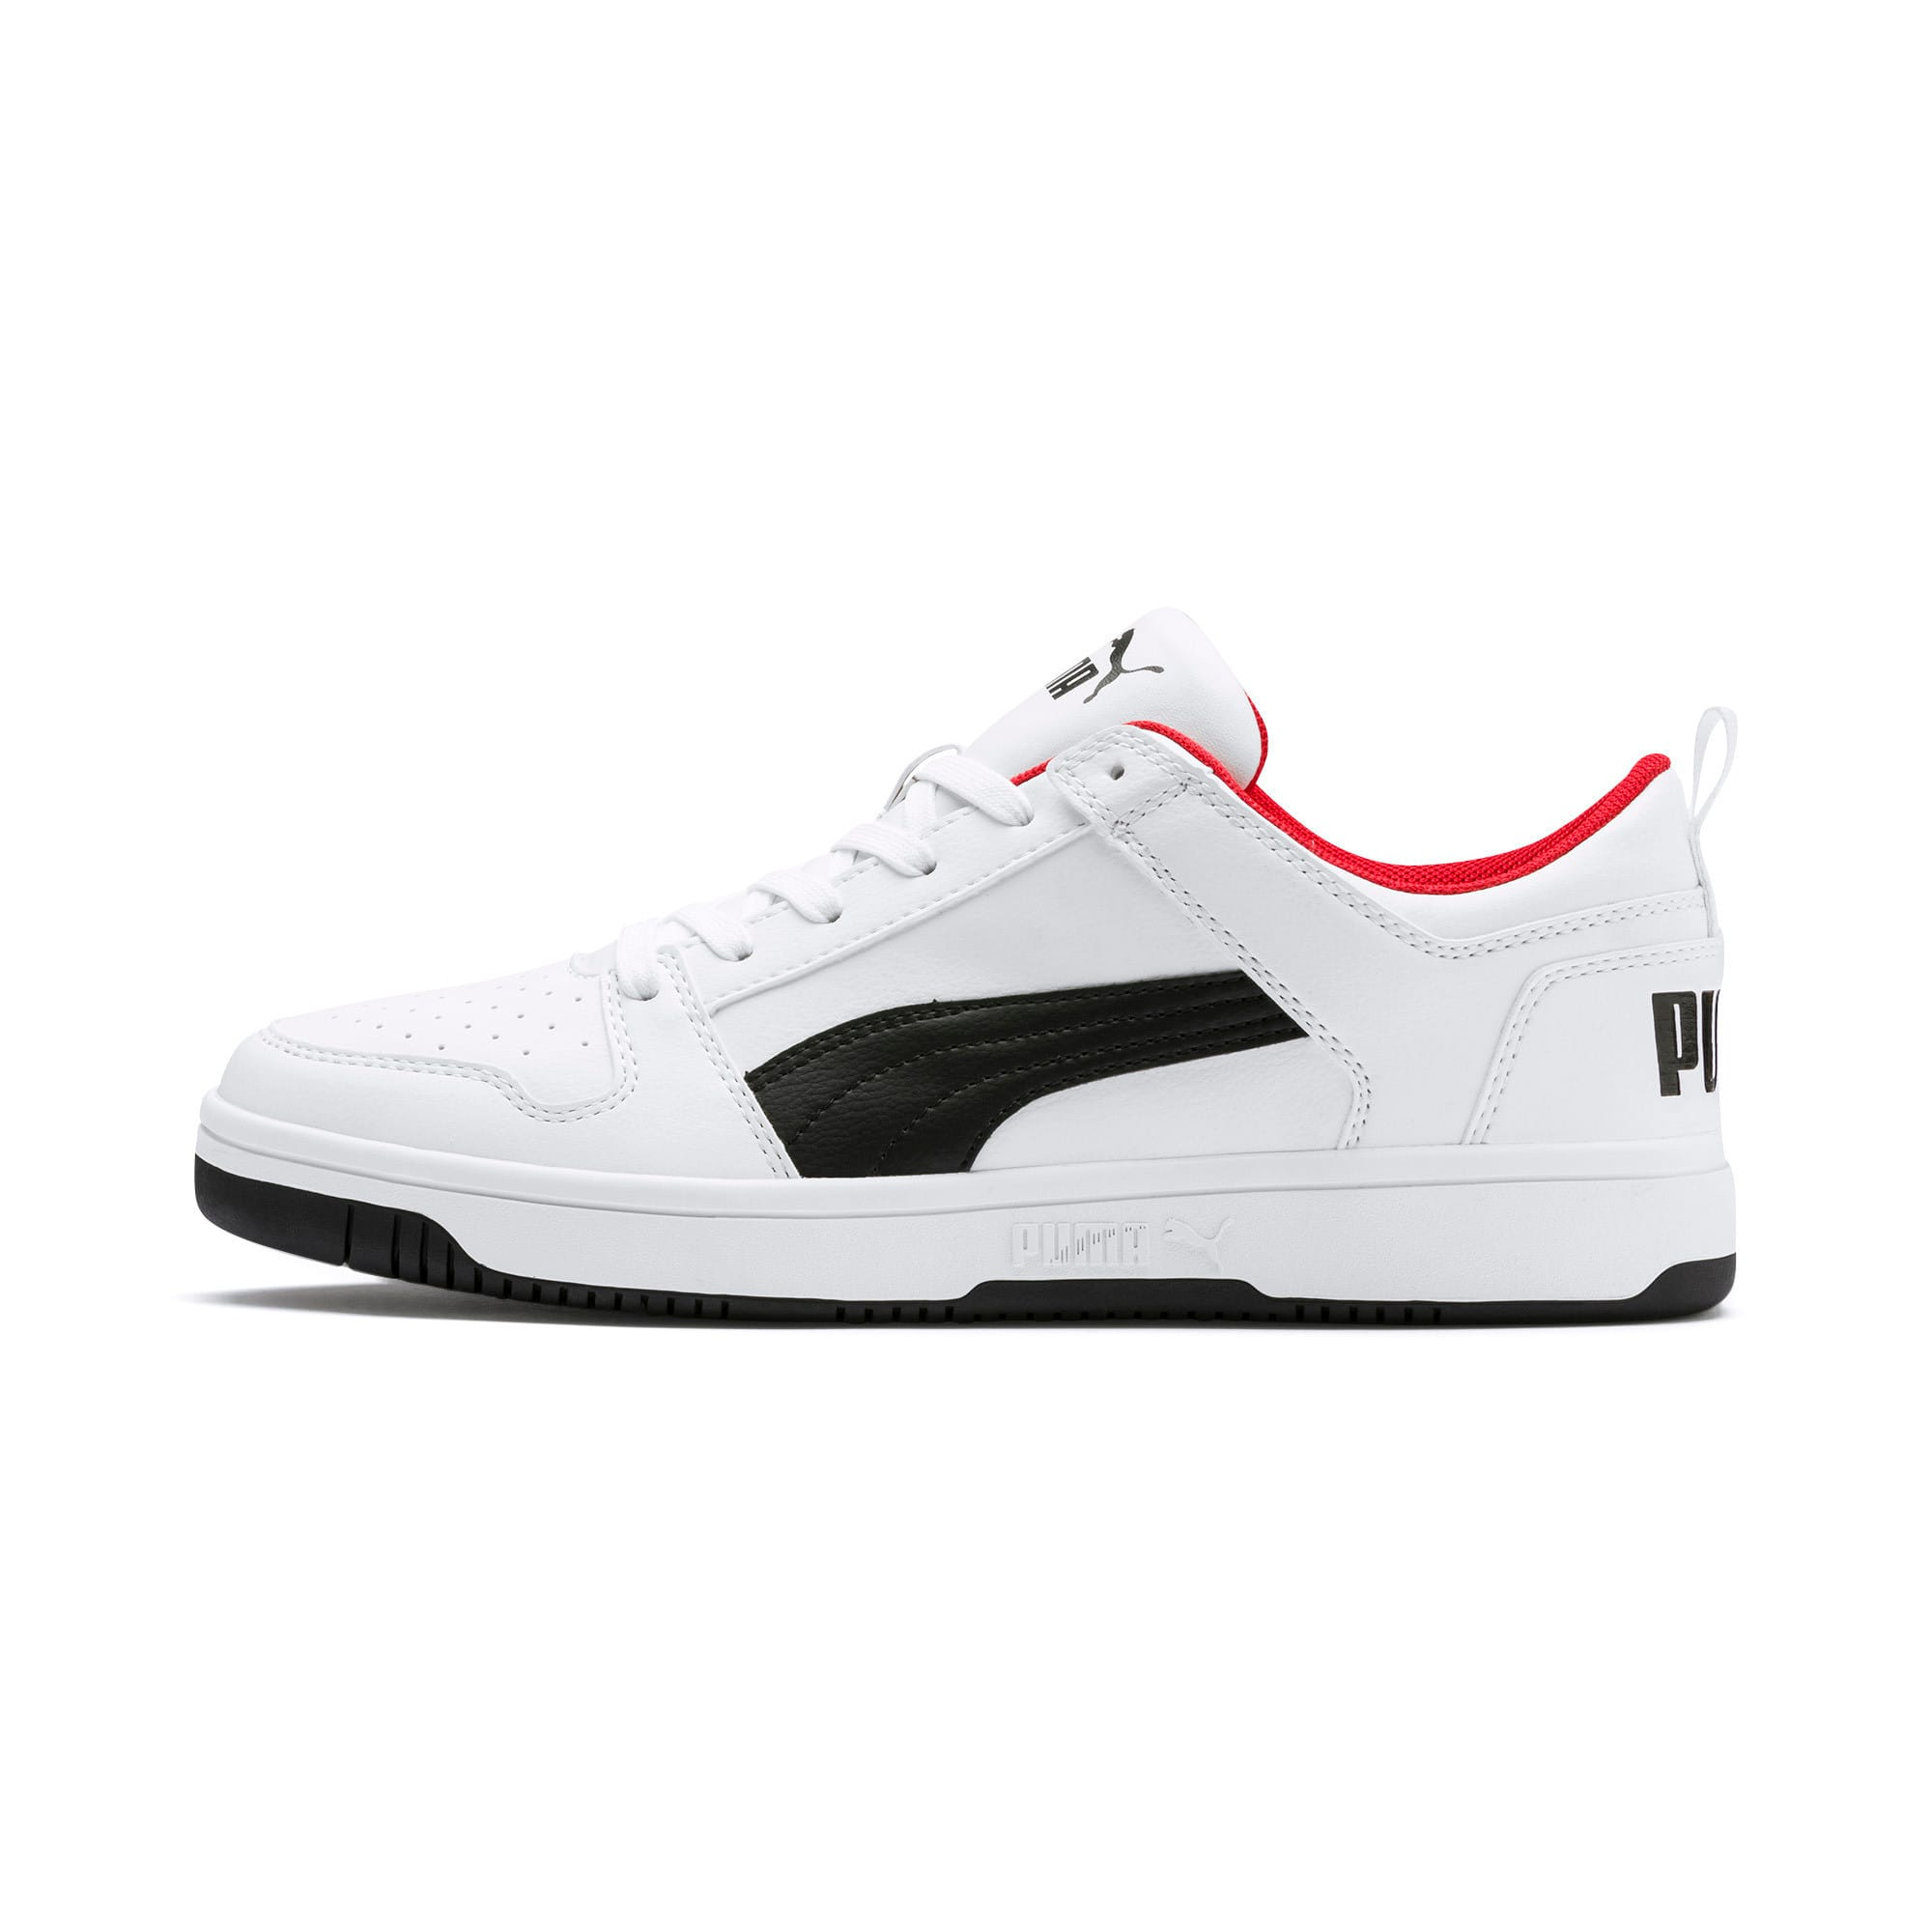 Miniatura 1 de Zapatos deportivos PUMA Rebound LayUp Lo, White-Black-High Risk Red, mediano